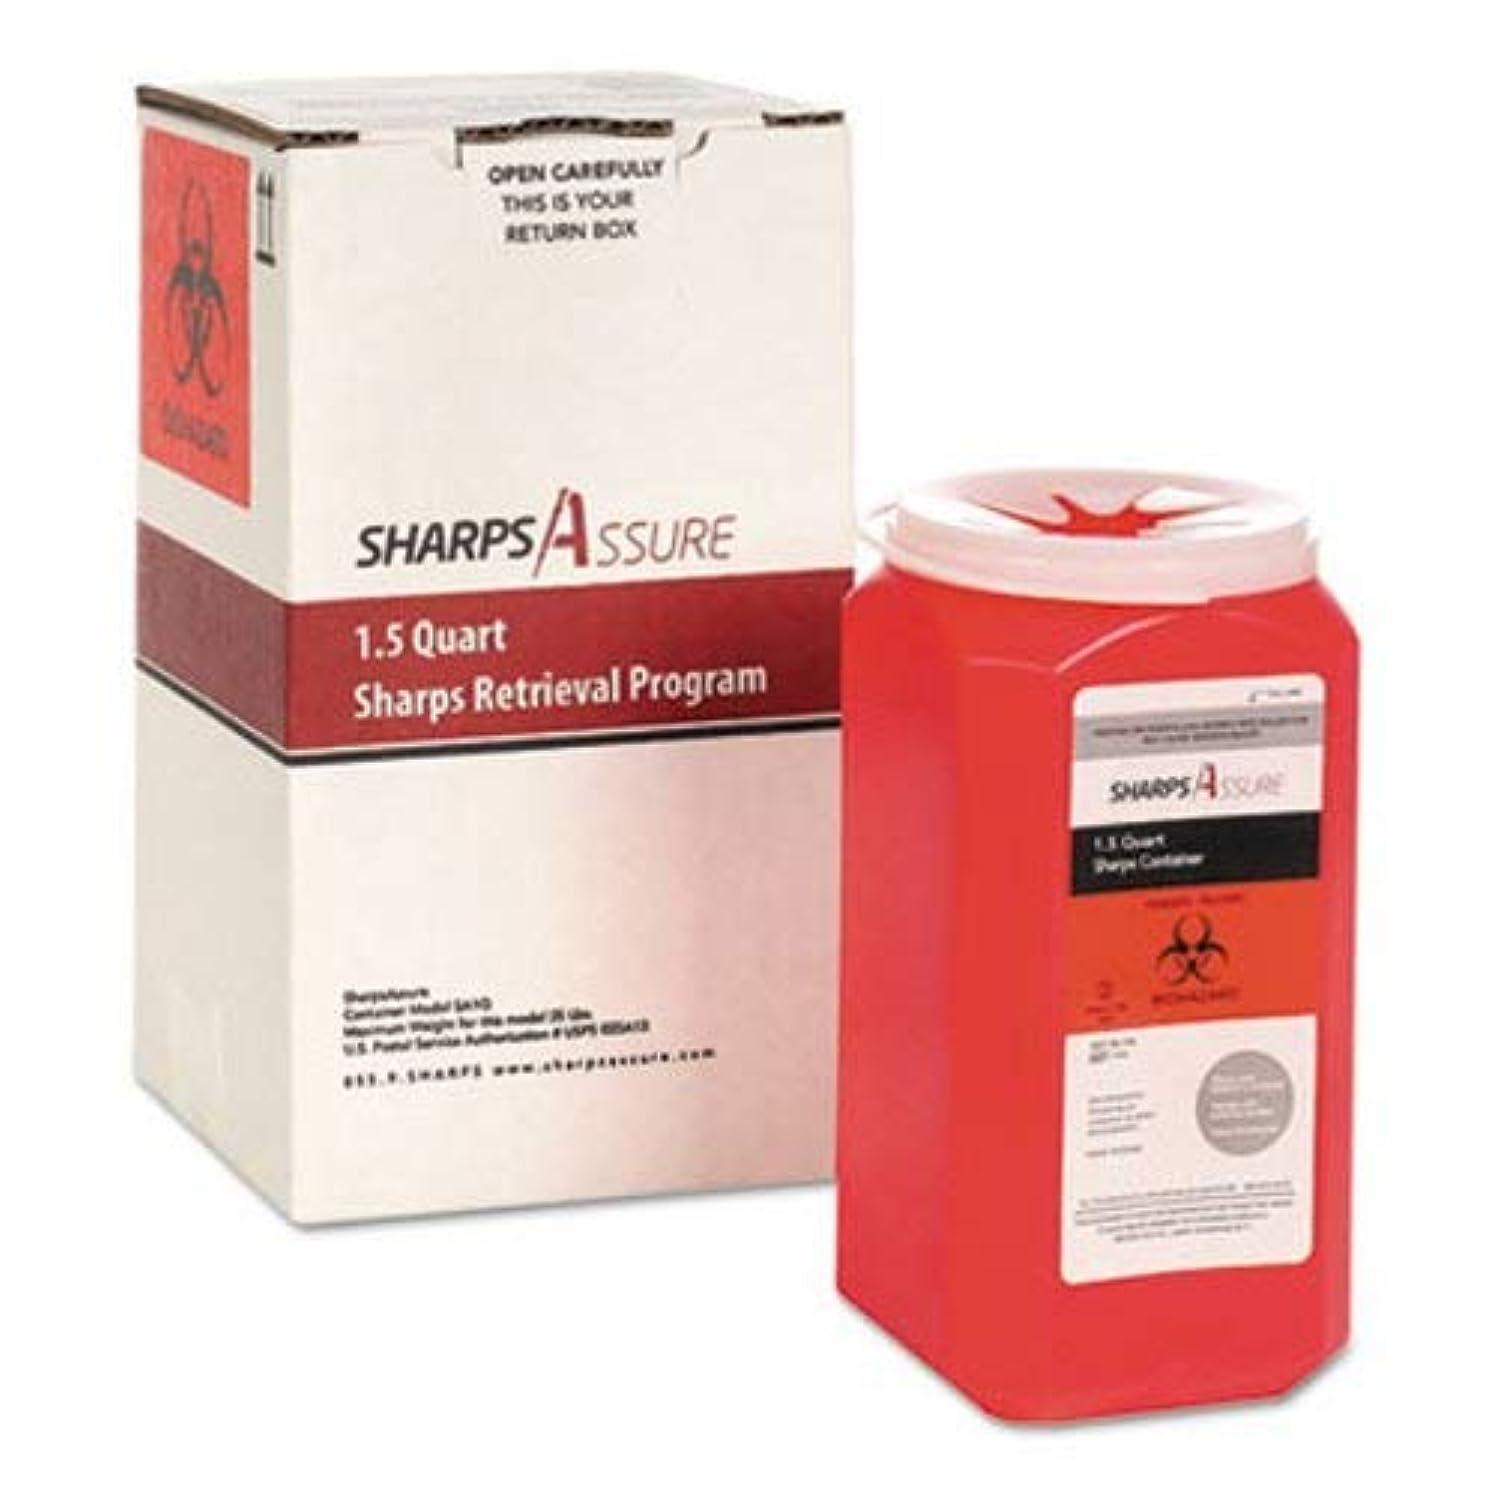 Trustmedical Sharps Retrieval Program Containers 1.5 qt, Plastic (TMDSC1Q424A1Q)